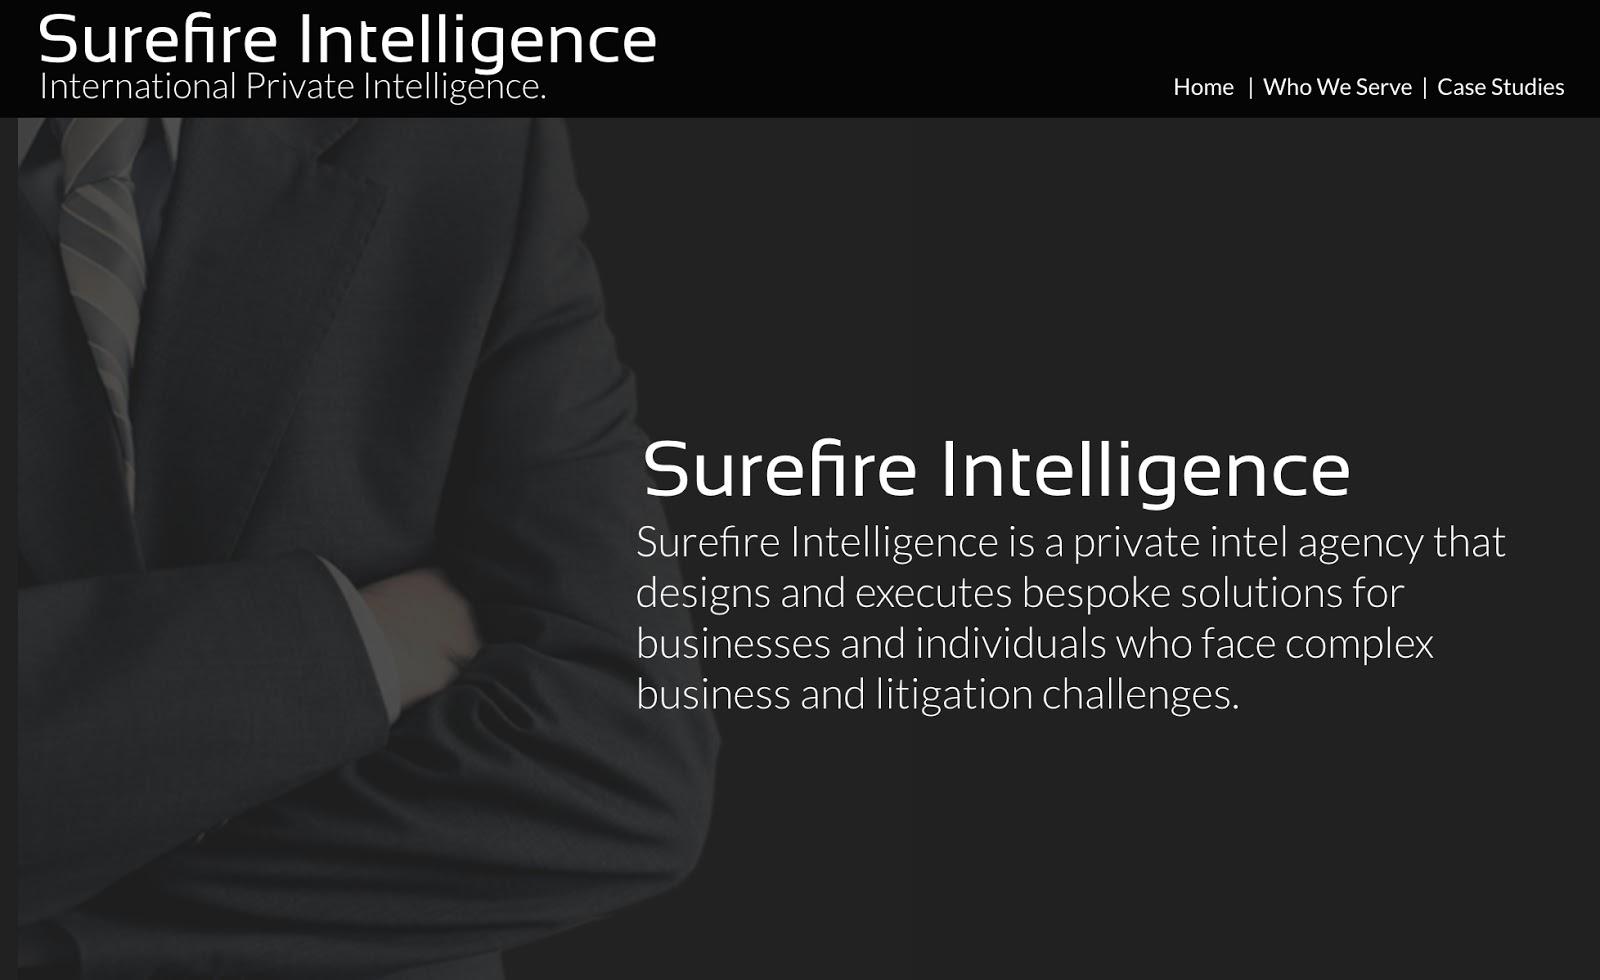 Surefire Intelligence website